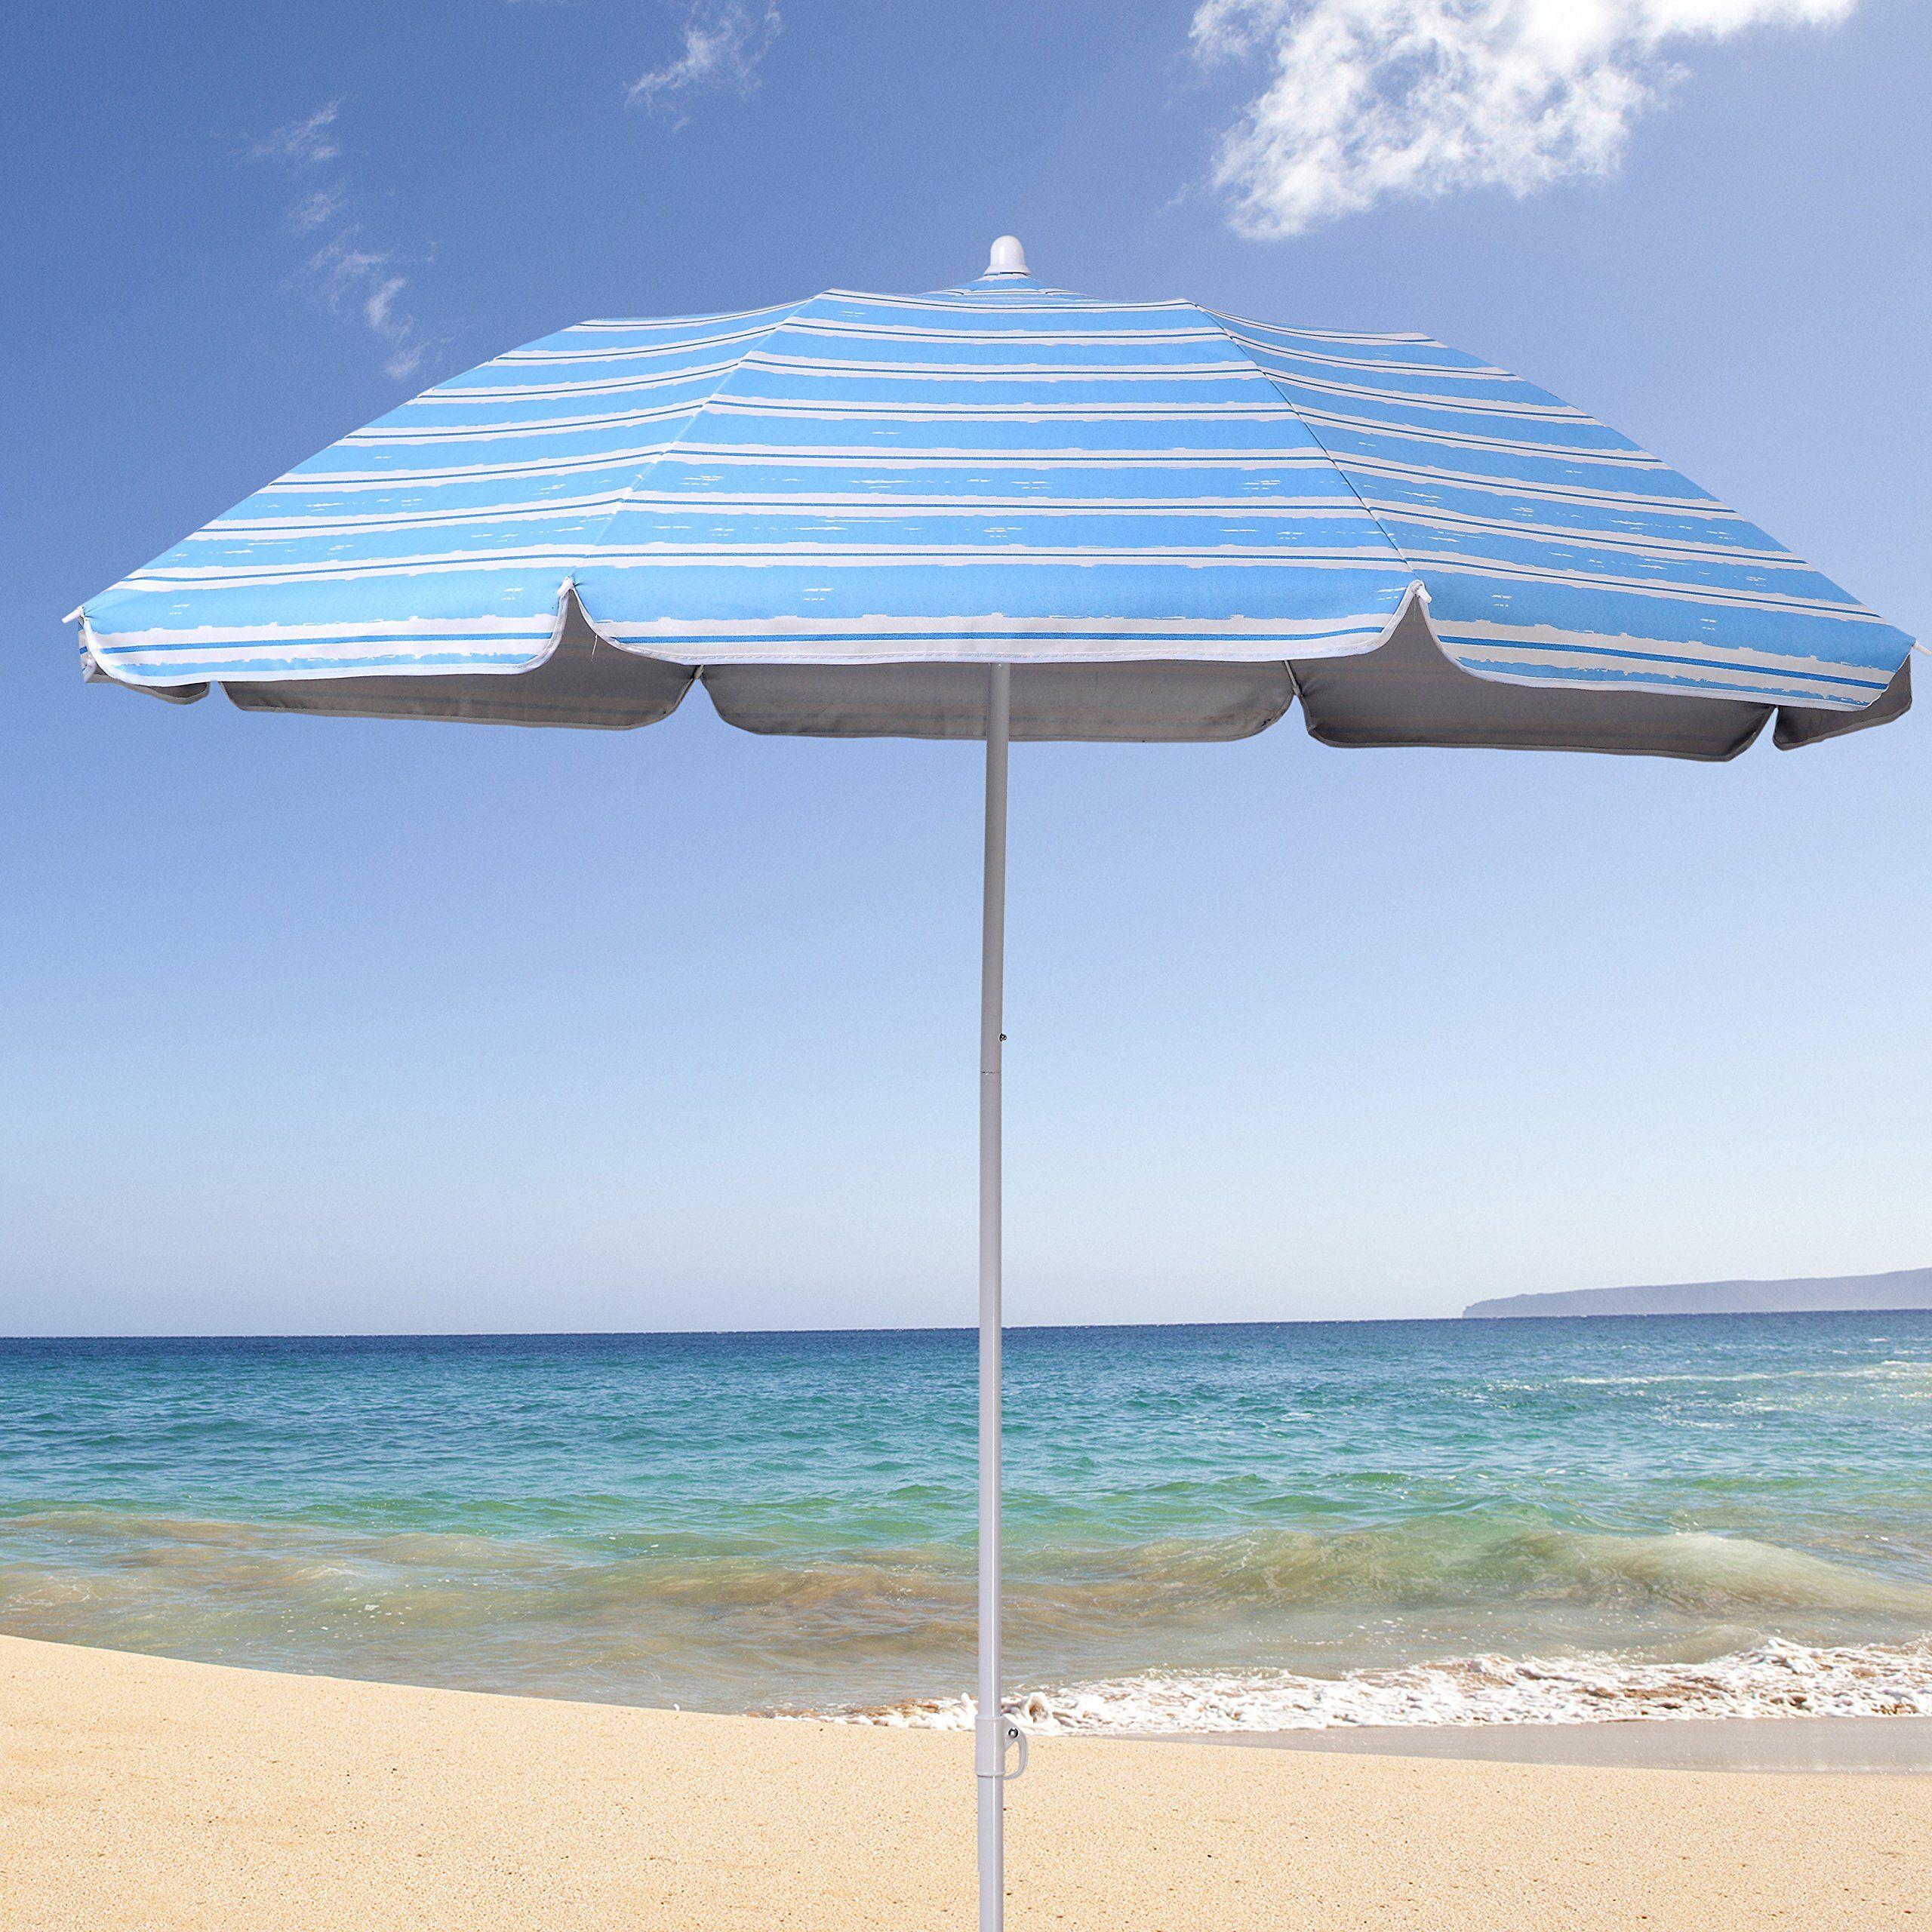 Ammsun 2017 6ft Folded Beach Umbrella With Tilt Portable Cabana Silver Coating Inside Uv Protection Stripe Blue